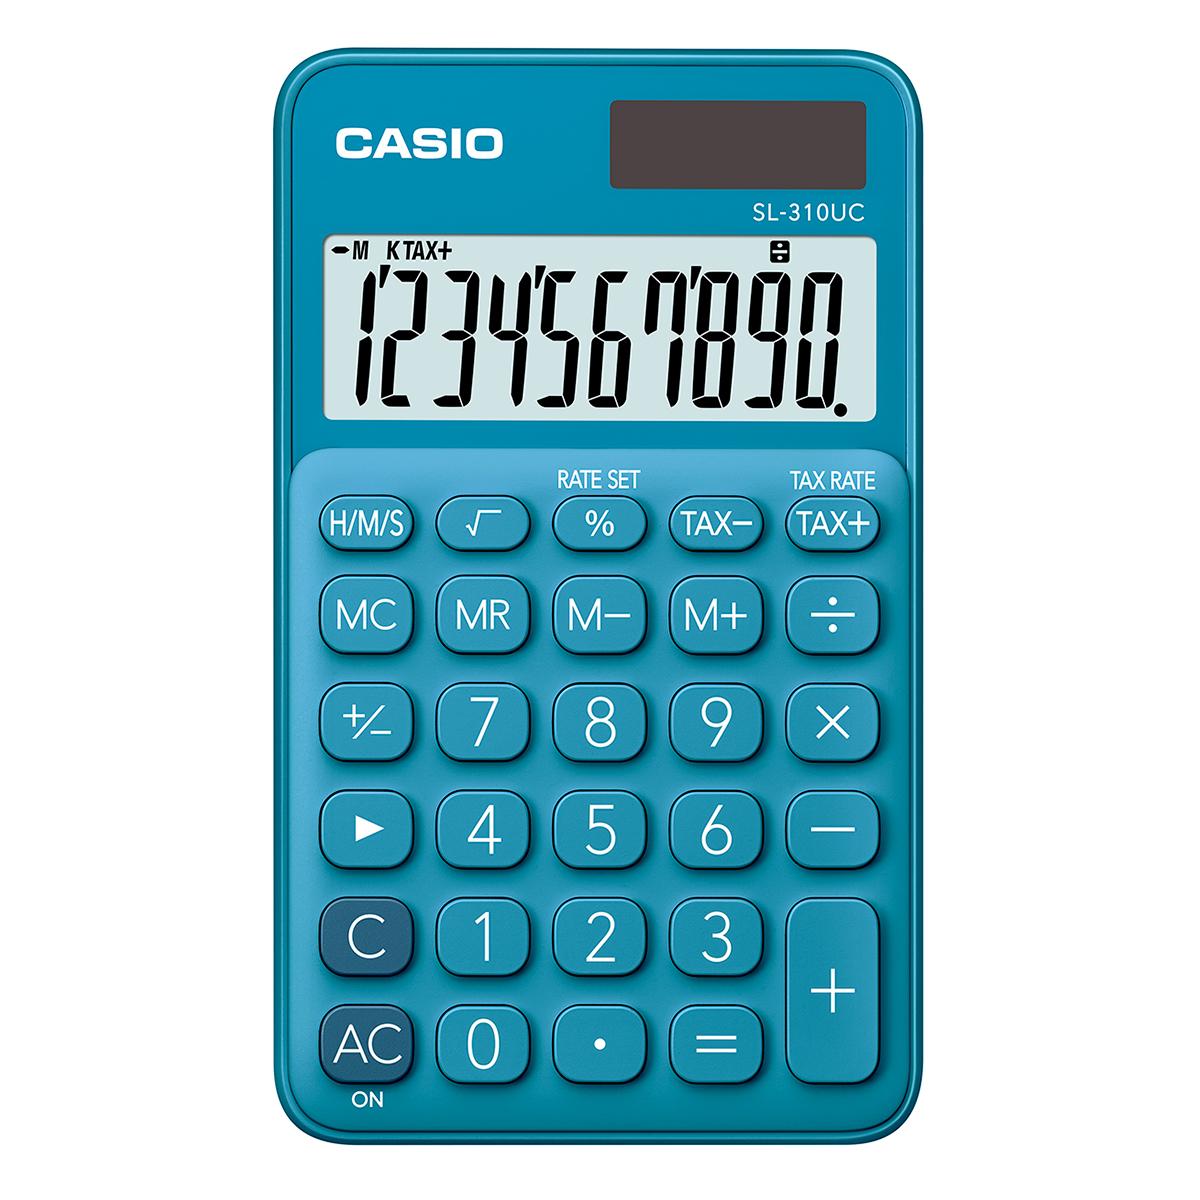 Casio SL-310UC Handheld Calculator Blue